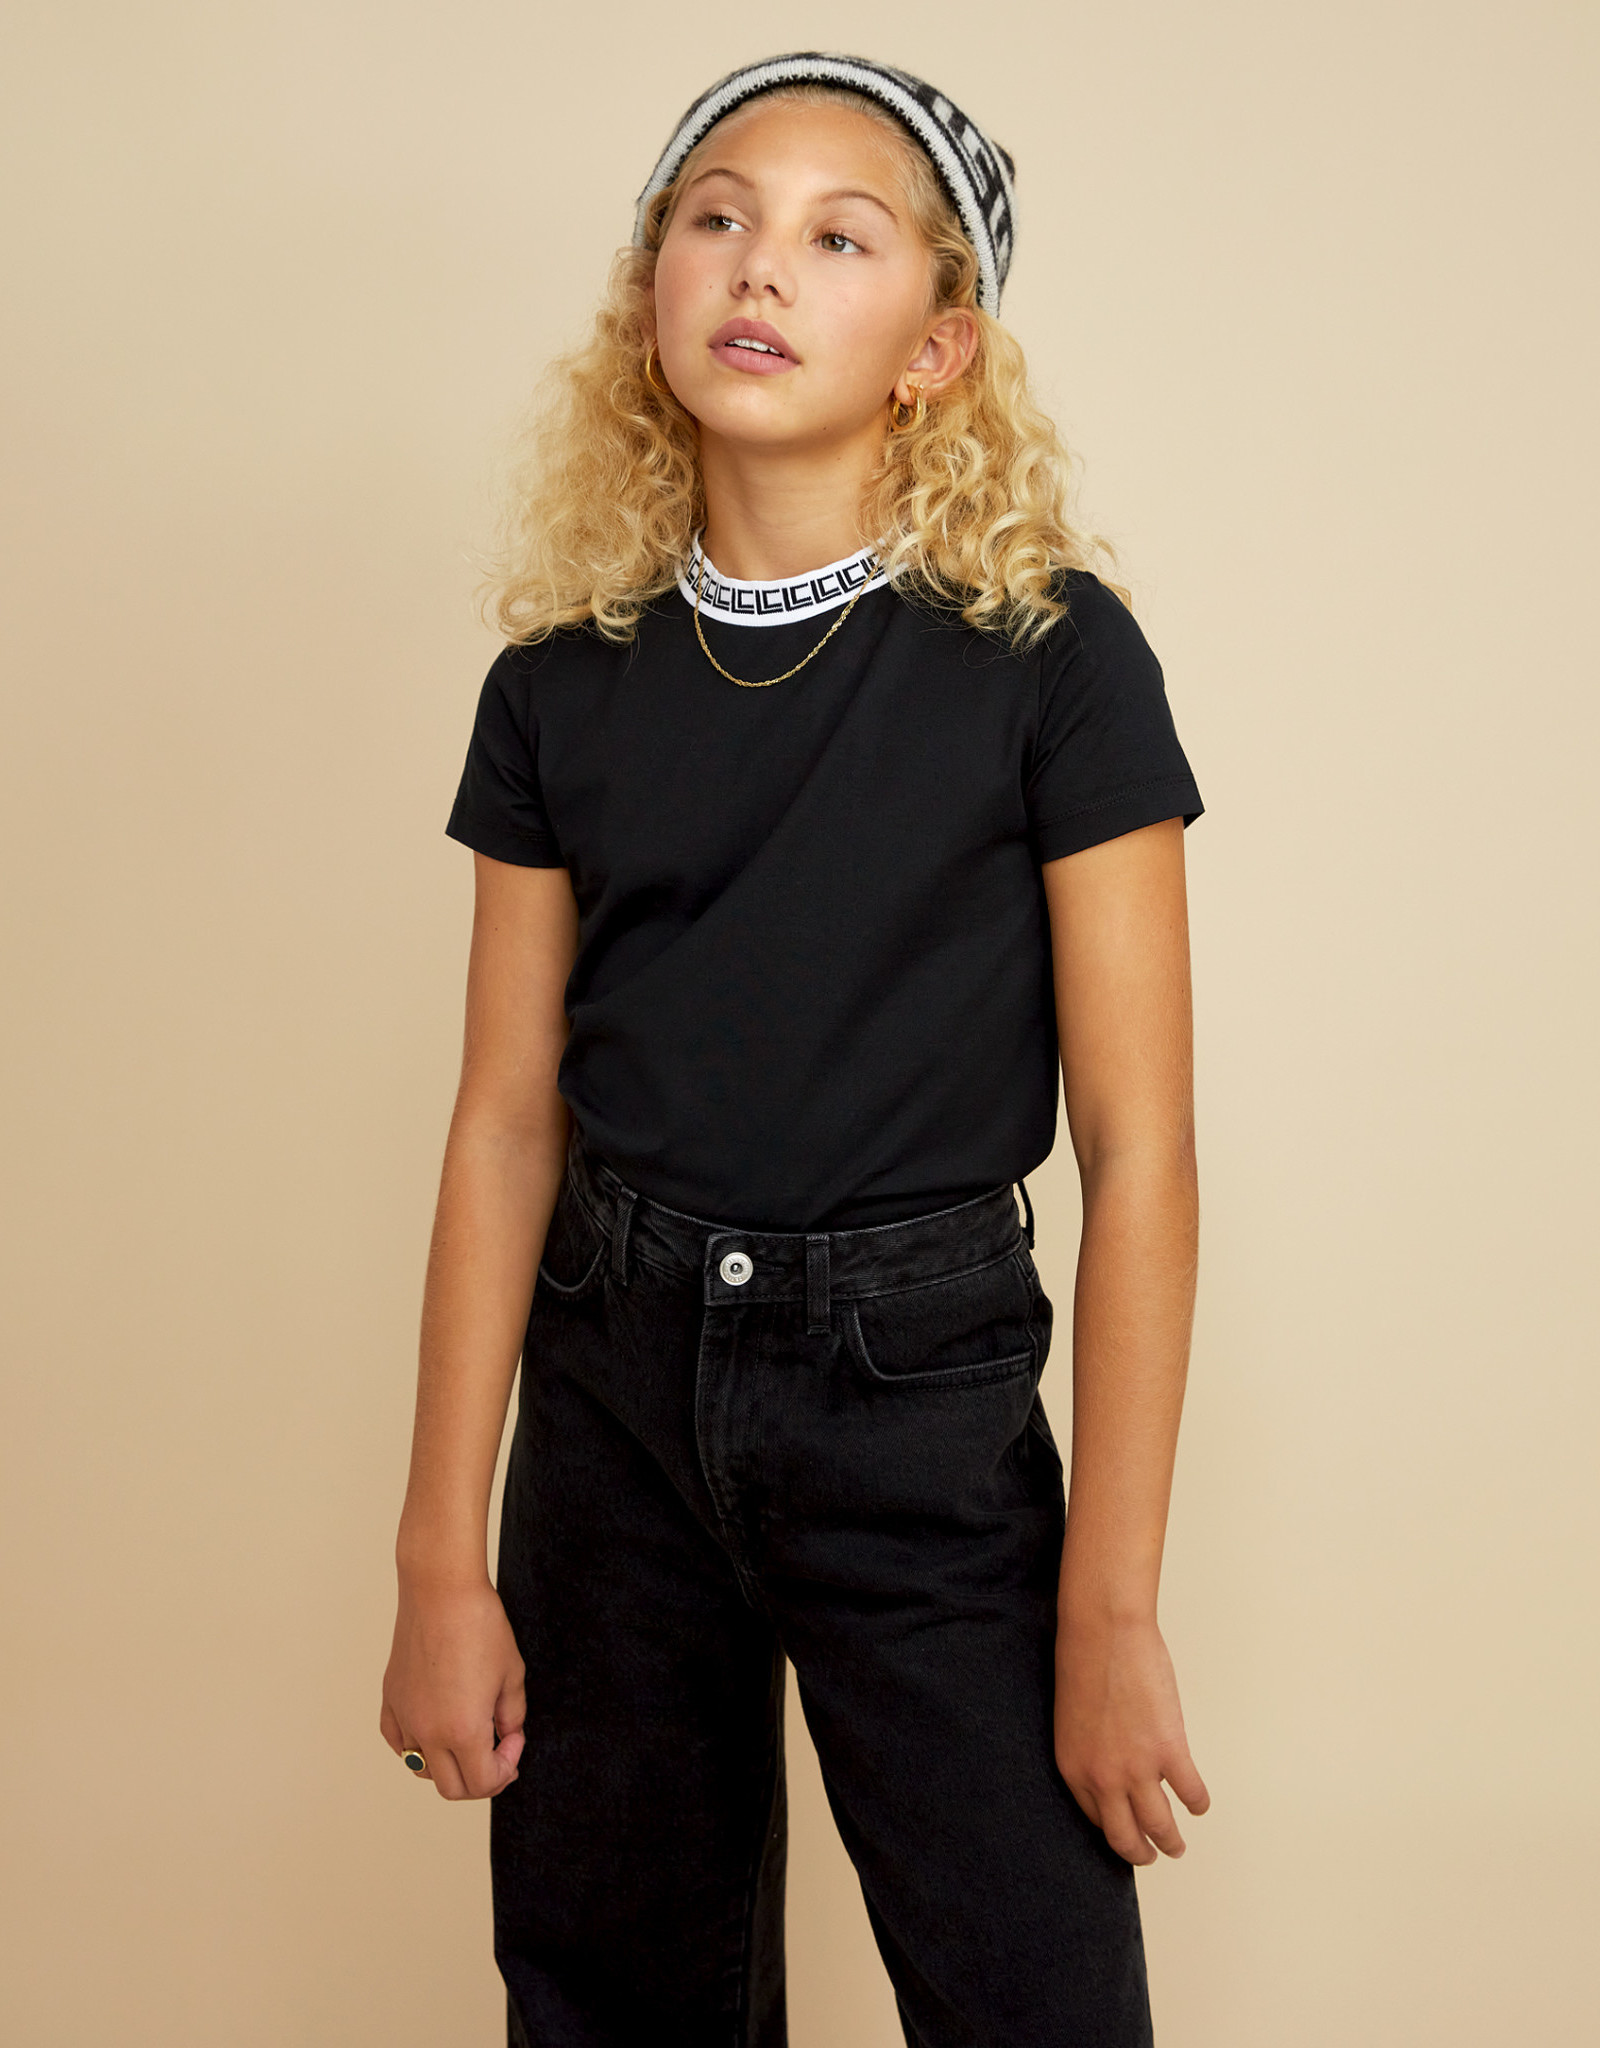 LES COYOTES DE PARIS Alisa noir t-shirt